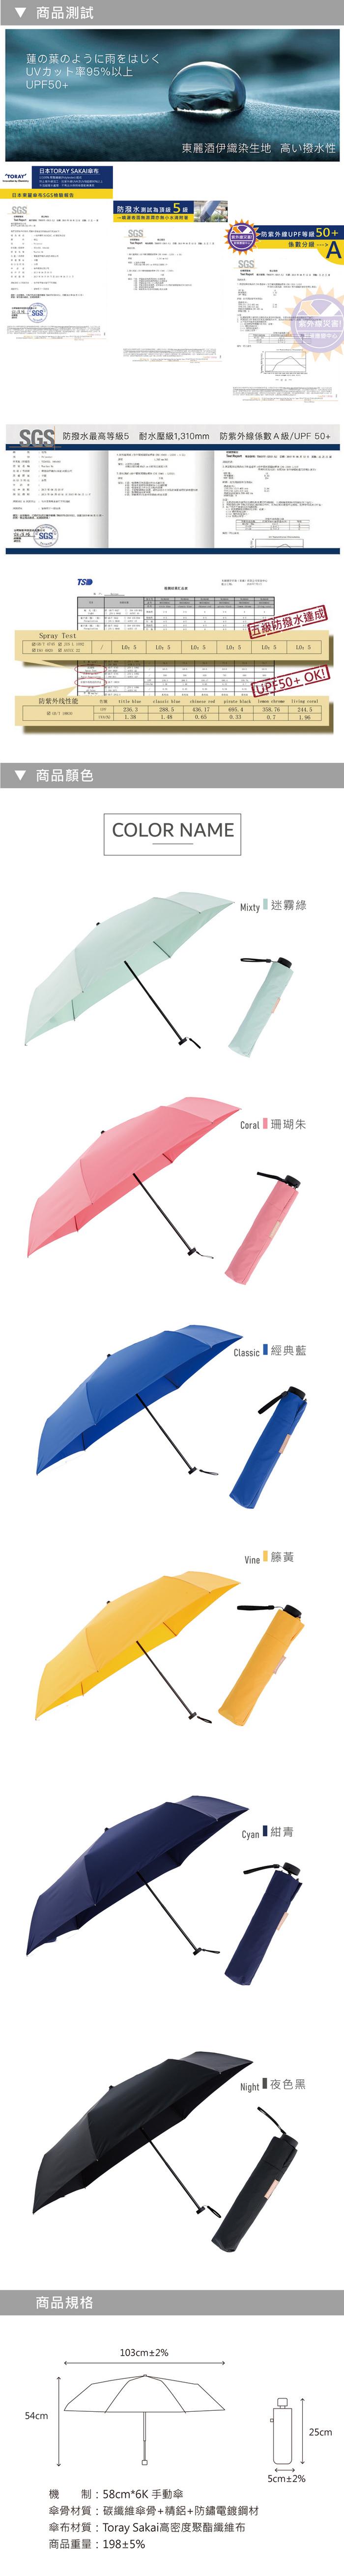 iumbrella| MECOVER (Toray Sakai碳纖防風超撥水手開傘)-6色任選